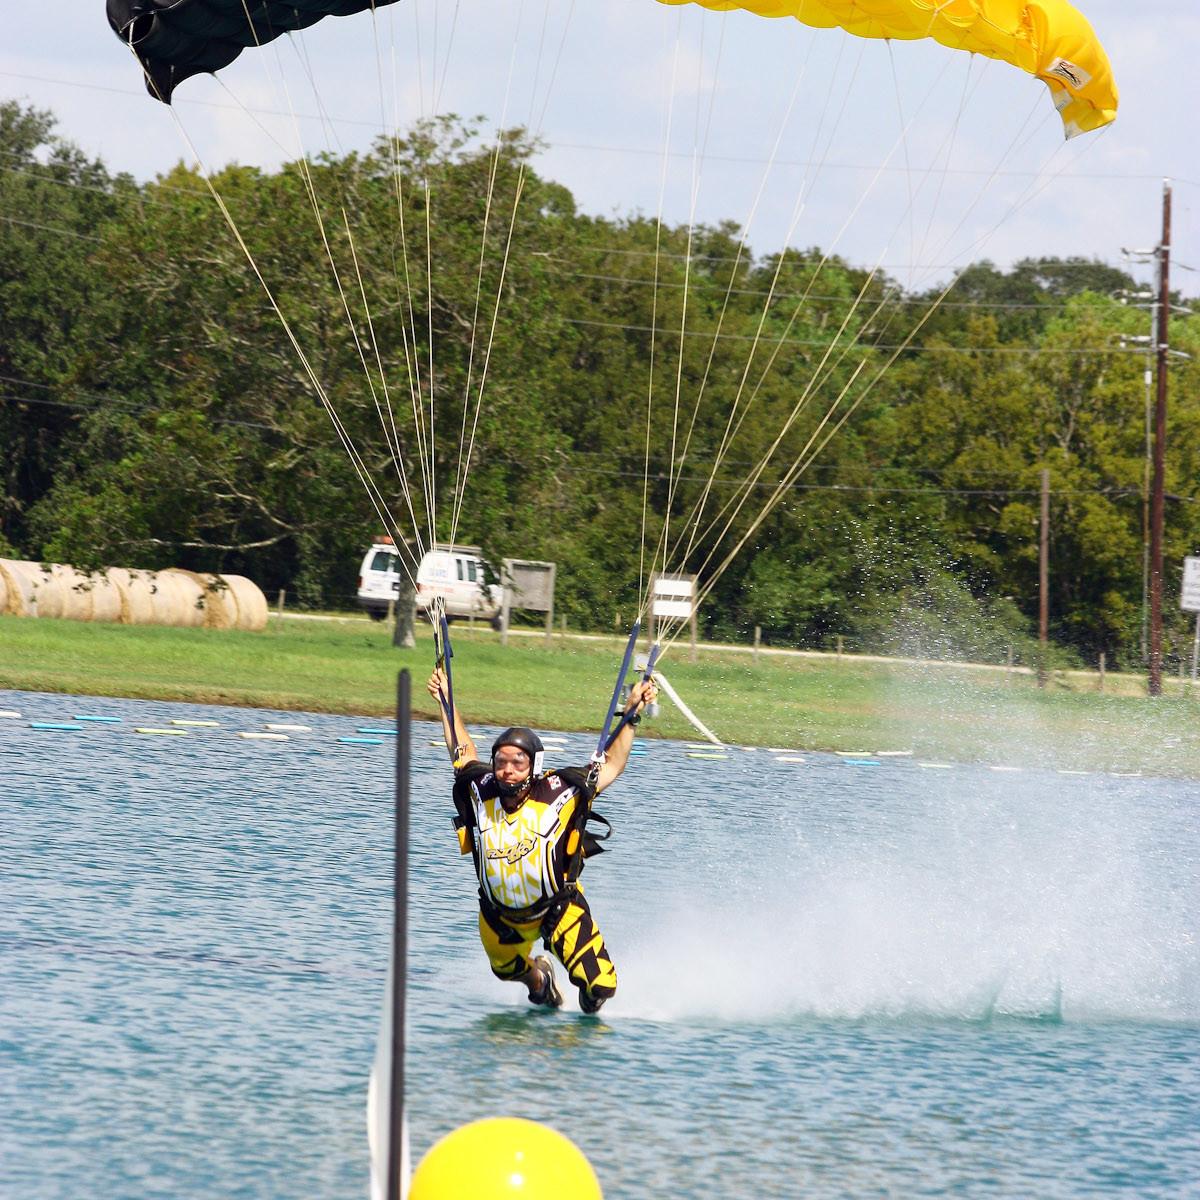 News_skydiving_Billy Sharman